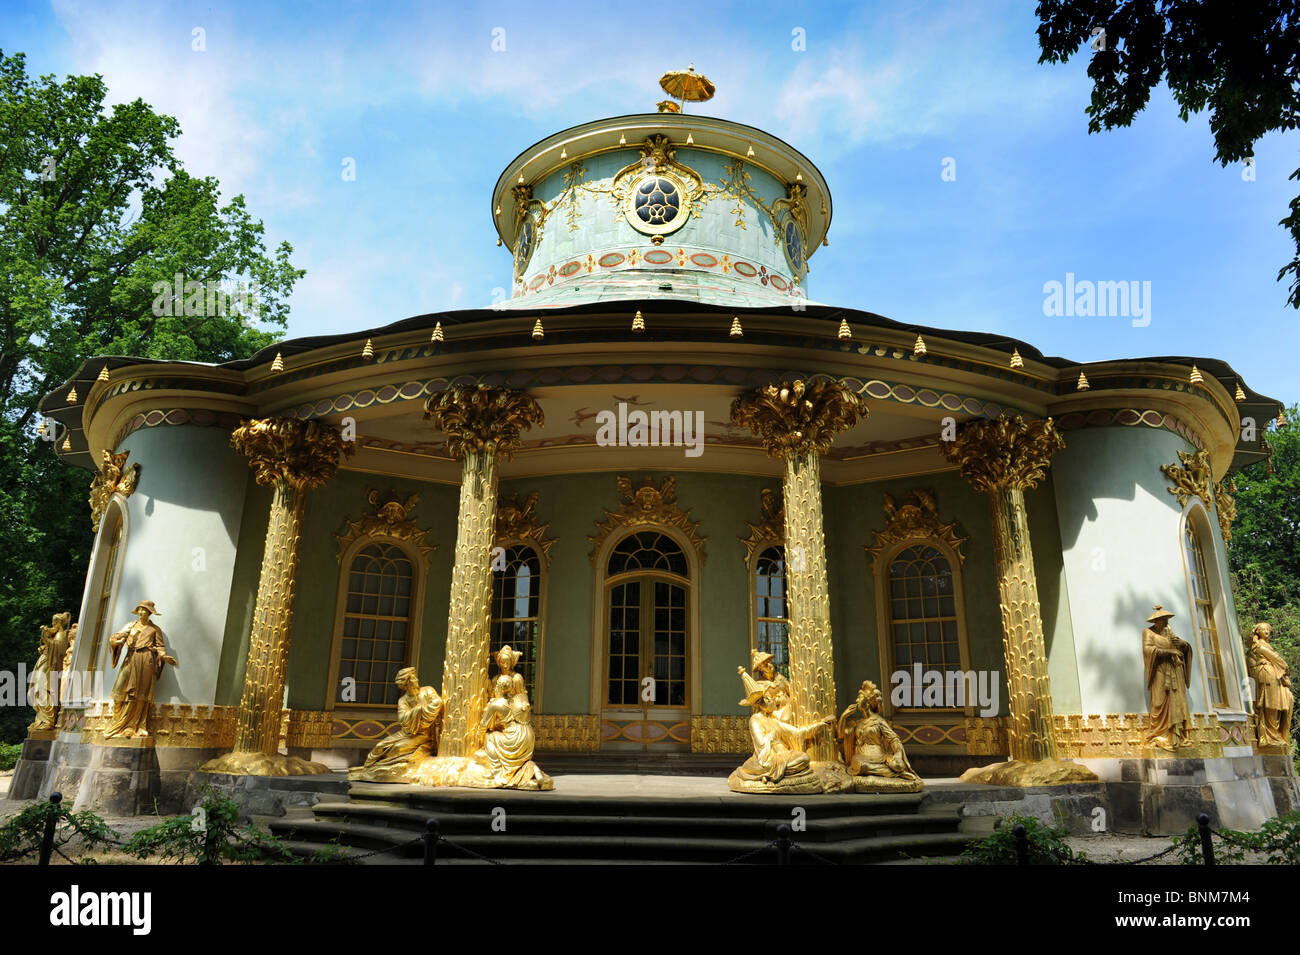 Chinese Tea House Sanssouci Park Potsdam Berlin Germany Deutschland Europe - Stock Image